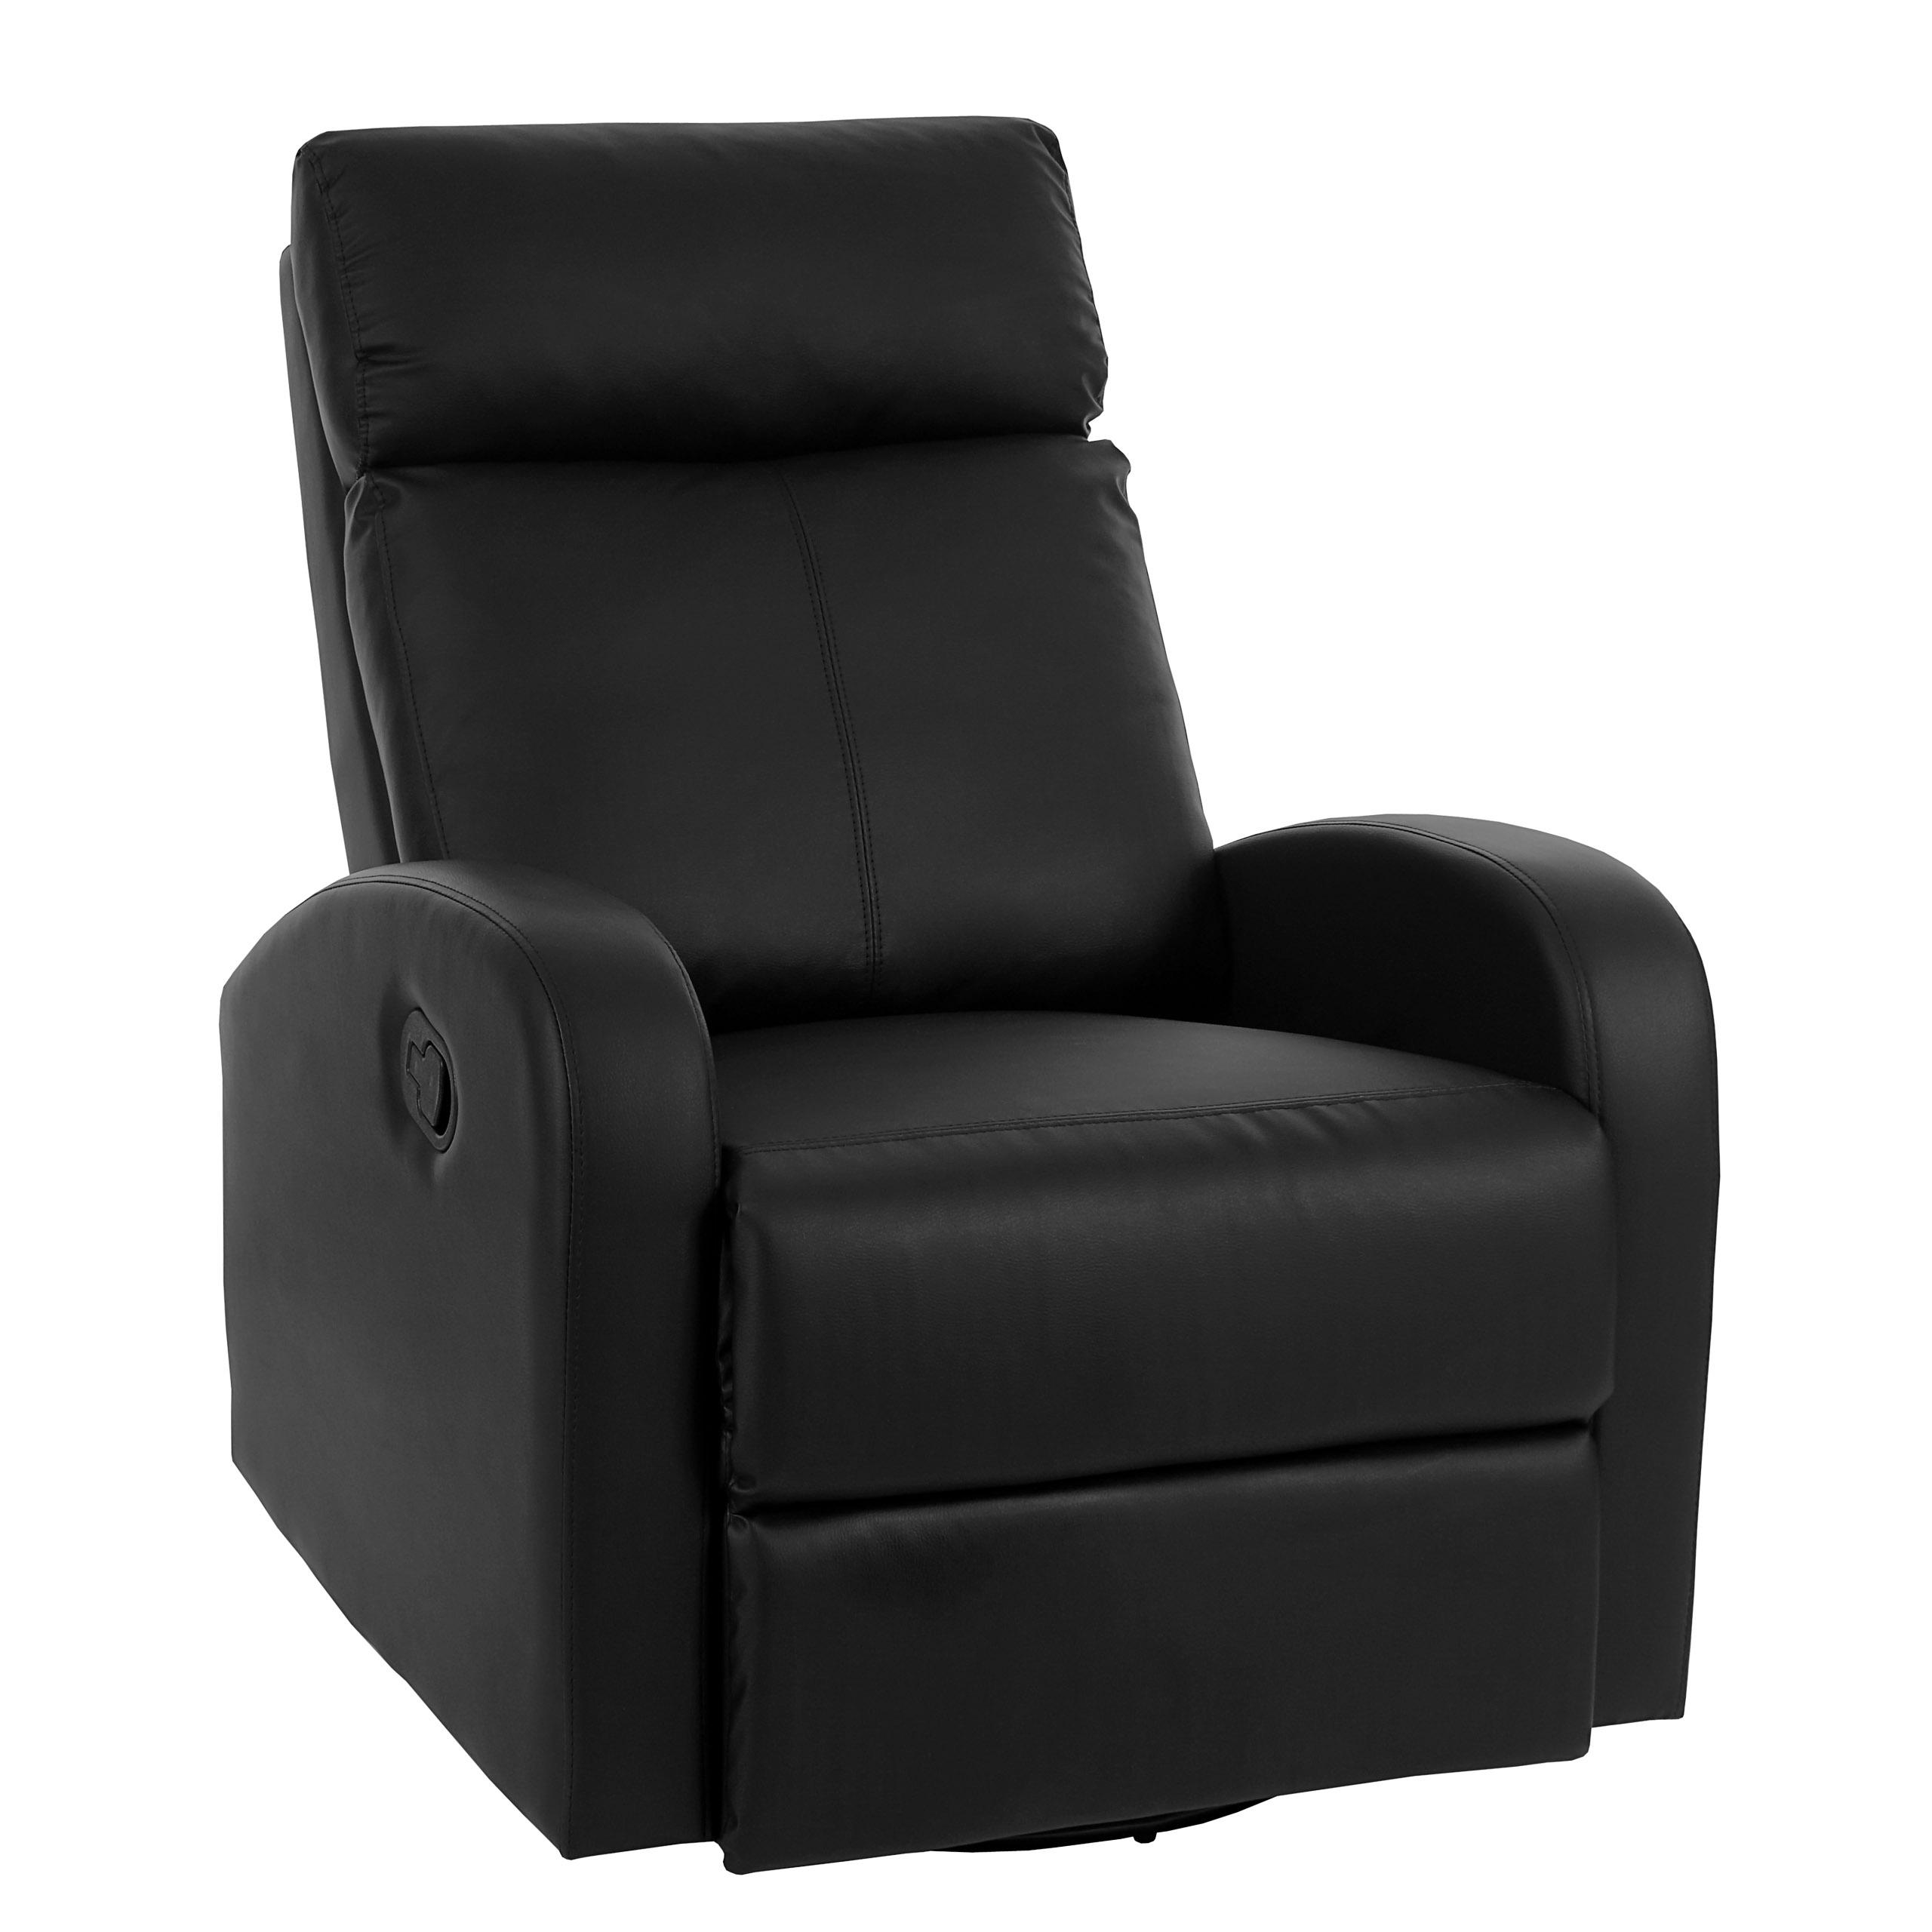 Schlafsessel günstig  Club-Sessel, Relaxstuhl, Lounge Sessel Leder günstig, Schlafsessel